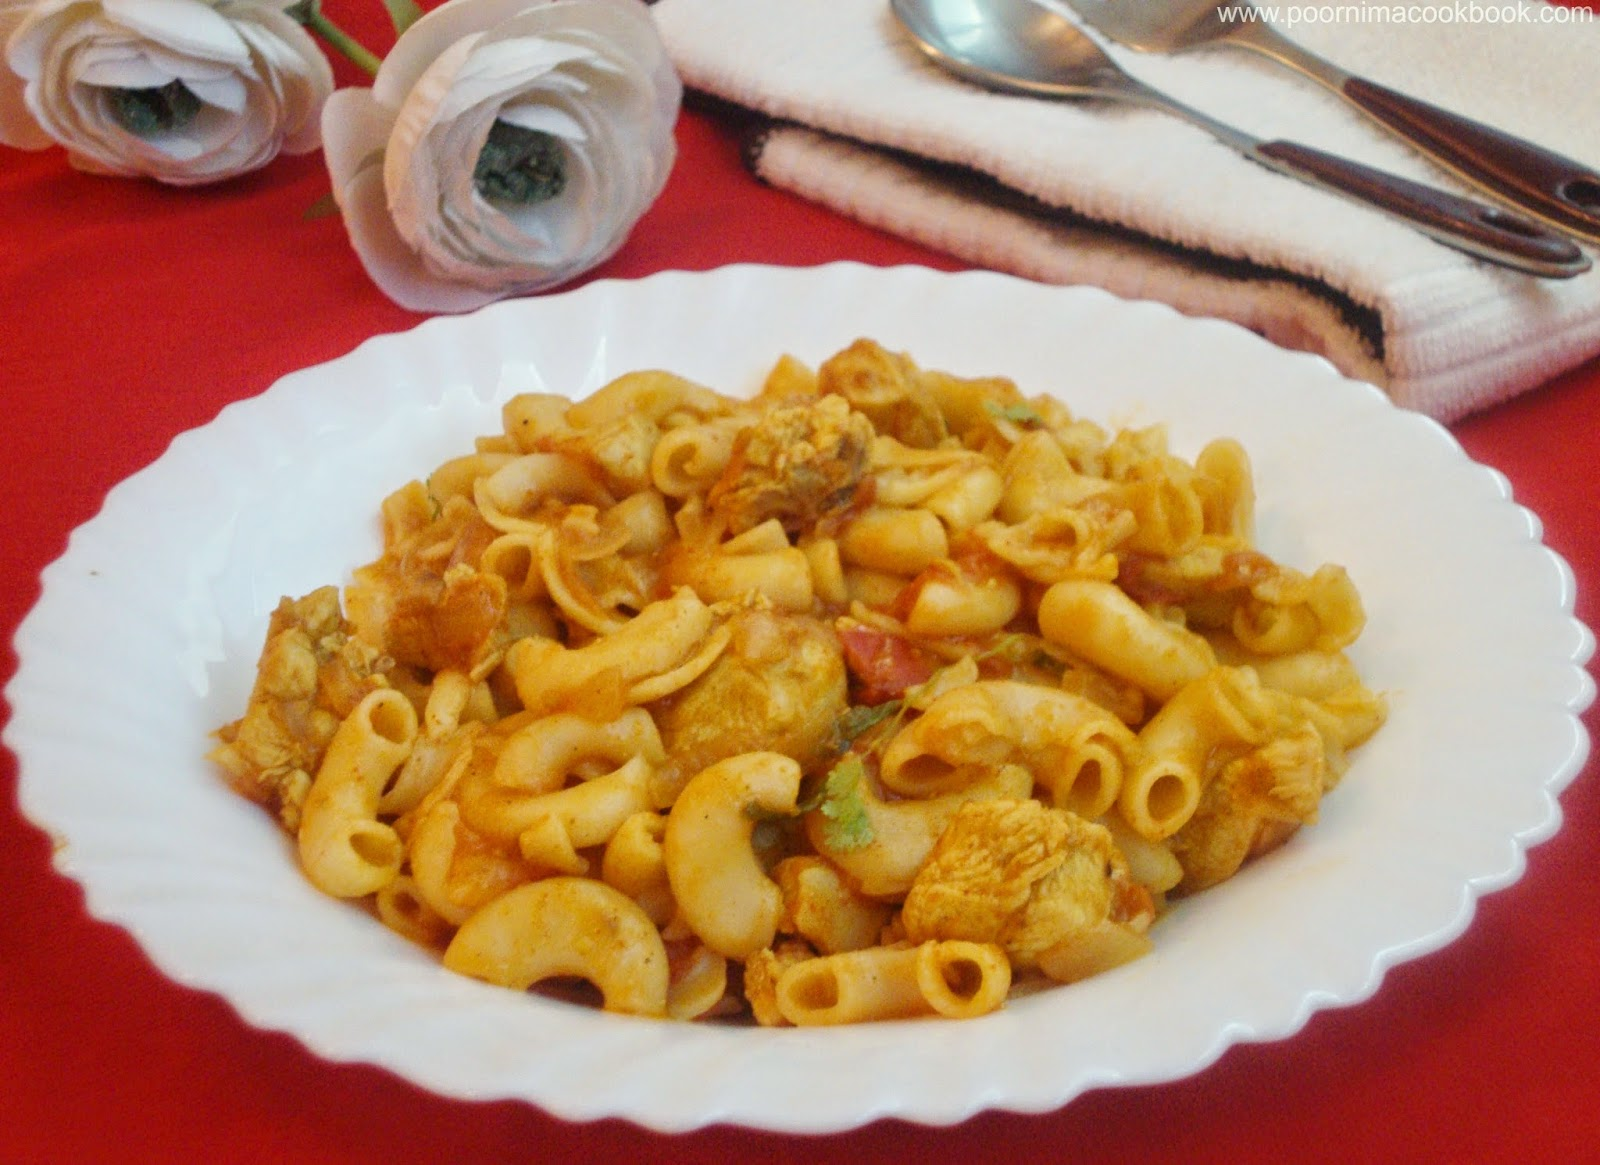 Poornimas cook book chicken masala pasta spicy masala pasta chicken masala pasta spicy masala pasta indian style forumfinder Images